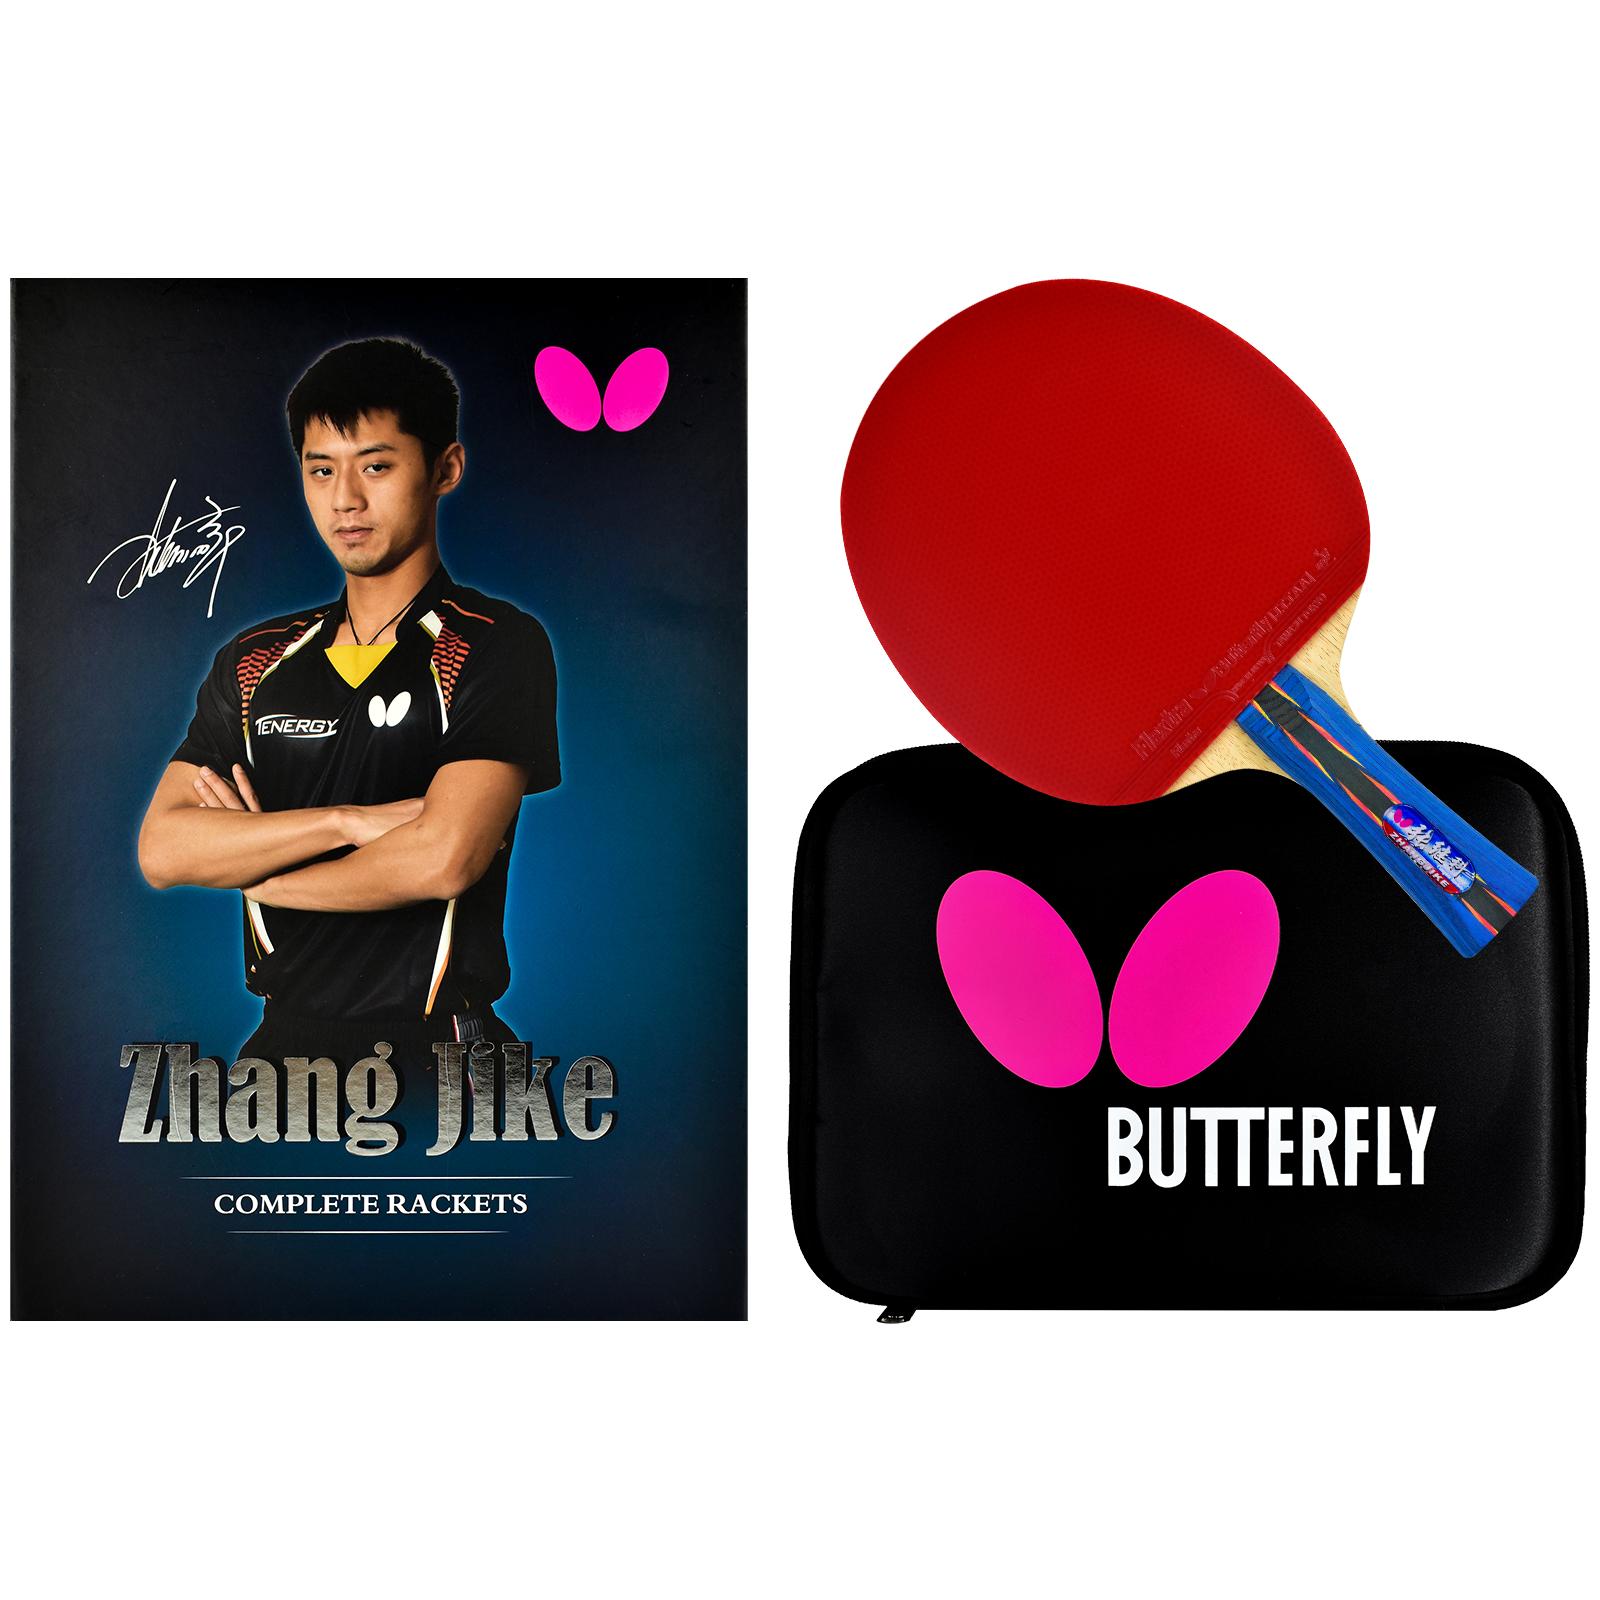 Zhang Jike Box Set Ebay